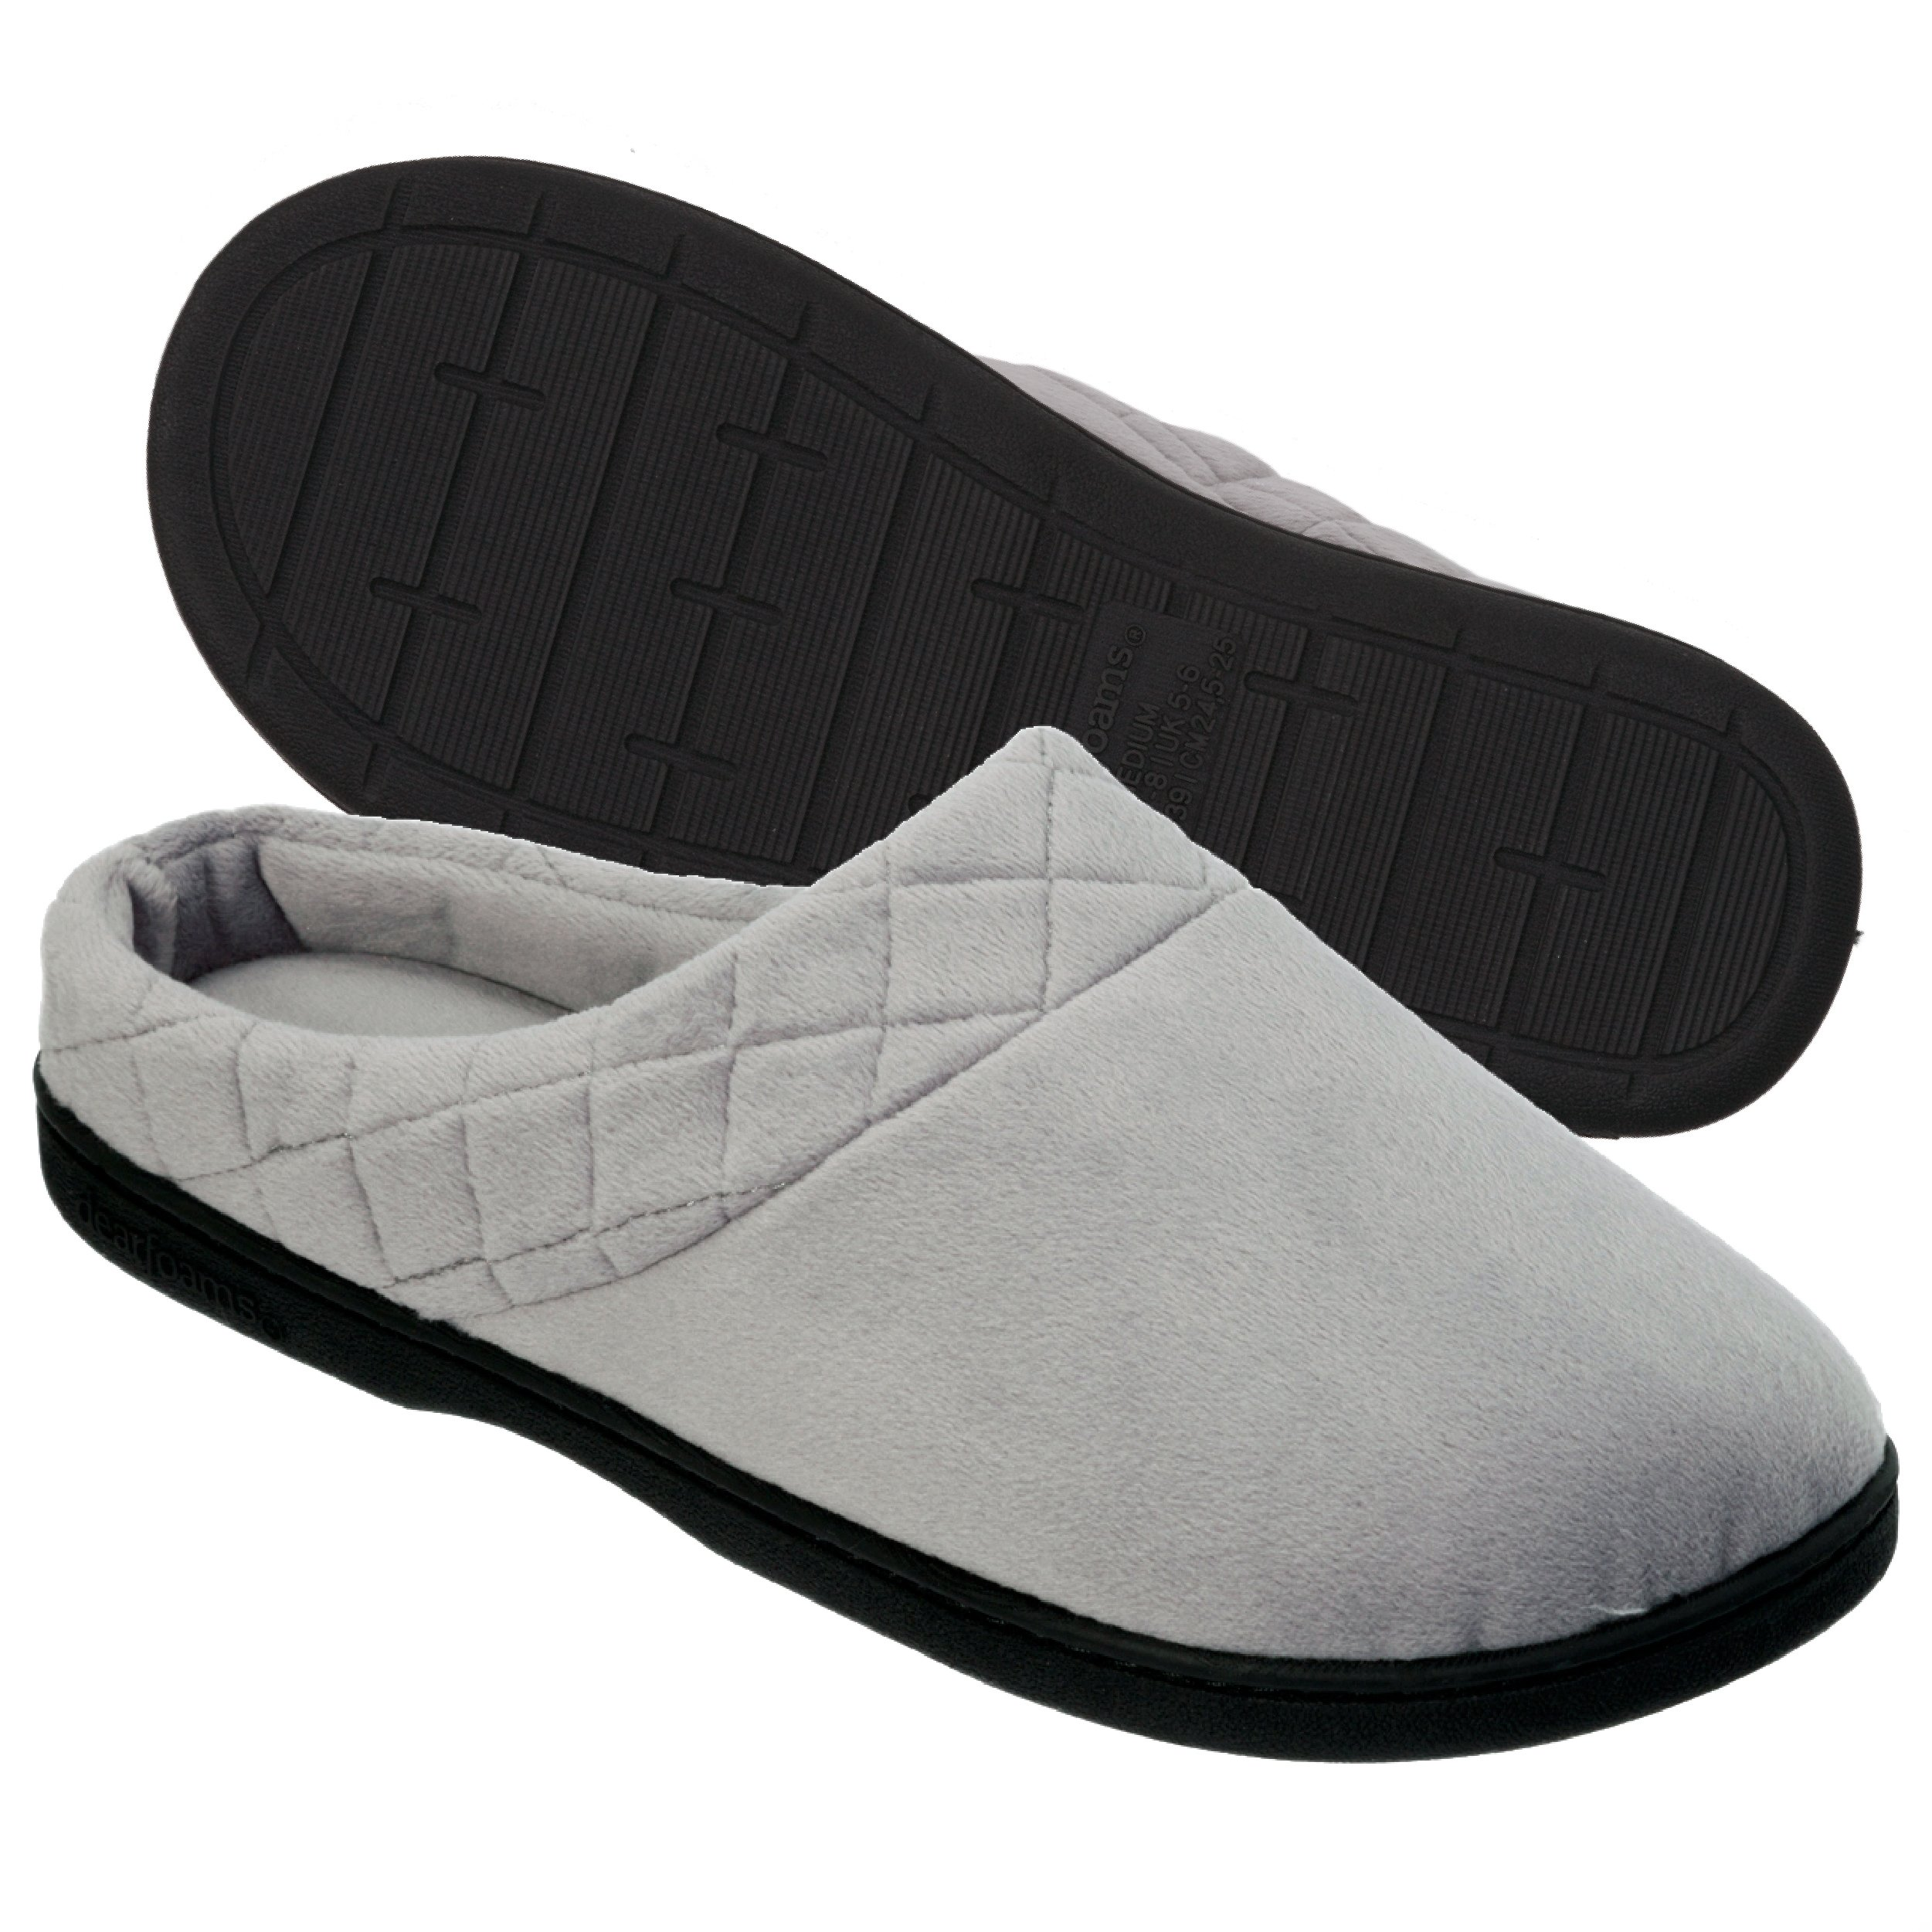 Dearfoams Women's Microfiber Clog Slipper with Quilted Cuff,Medium Grey,Large/9-10 M US